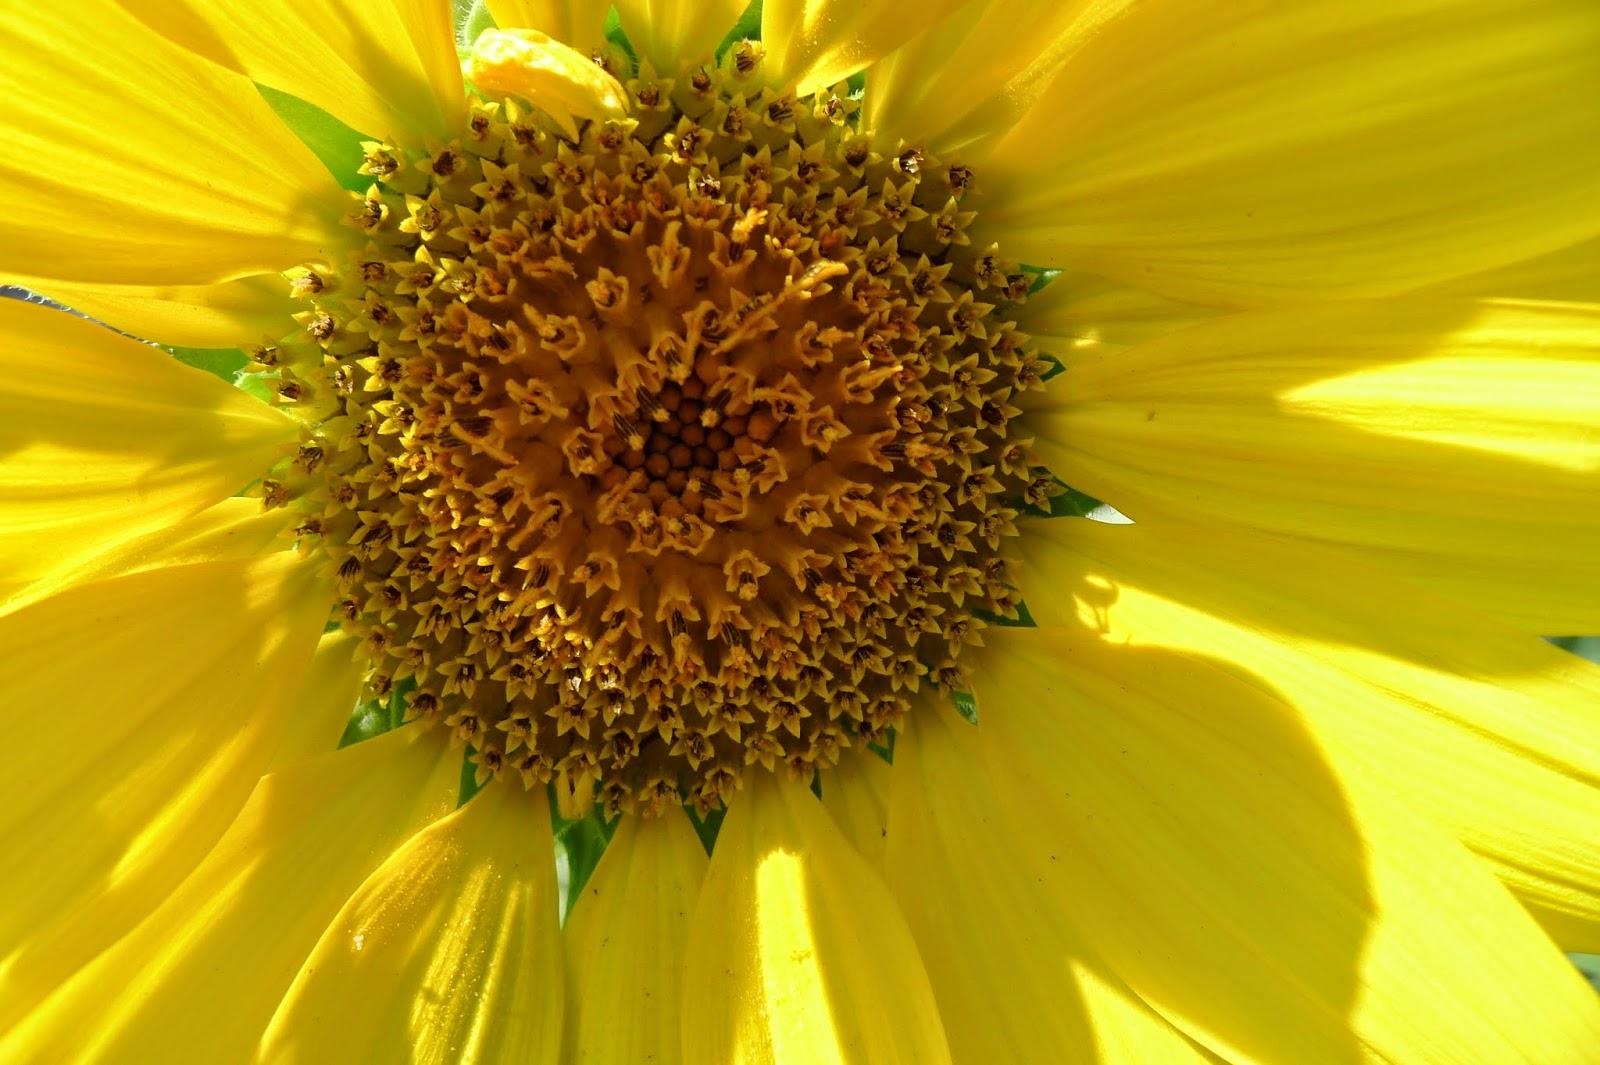 Sunseed Sunflower, gardening, urban farming